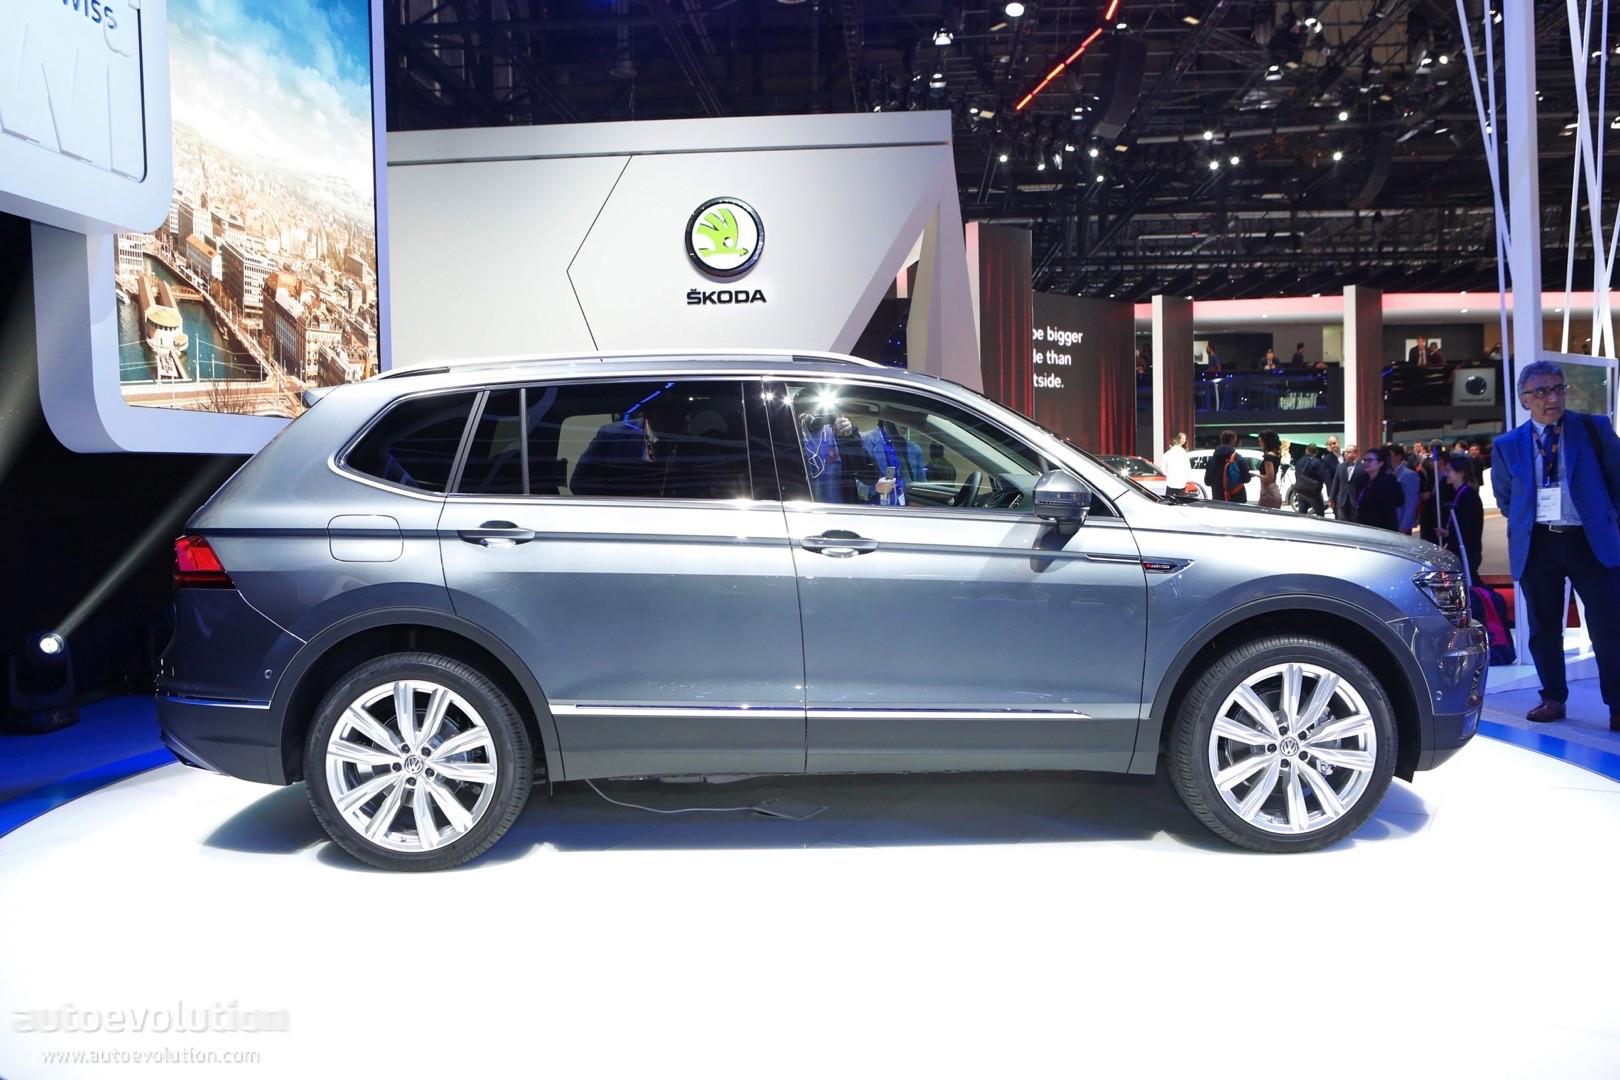 2018 Volkswagen Tiguan Aces IIHS Crash Tests Despite Bad Headlight Performance - autoevolution